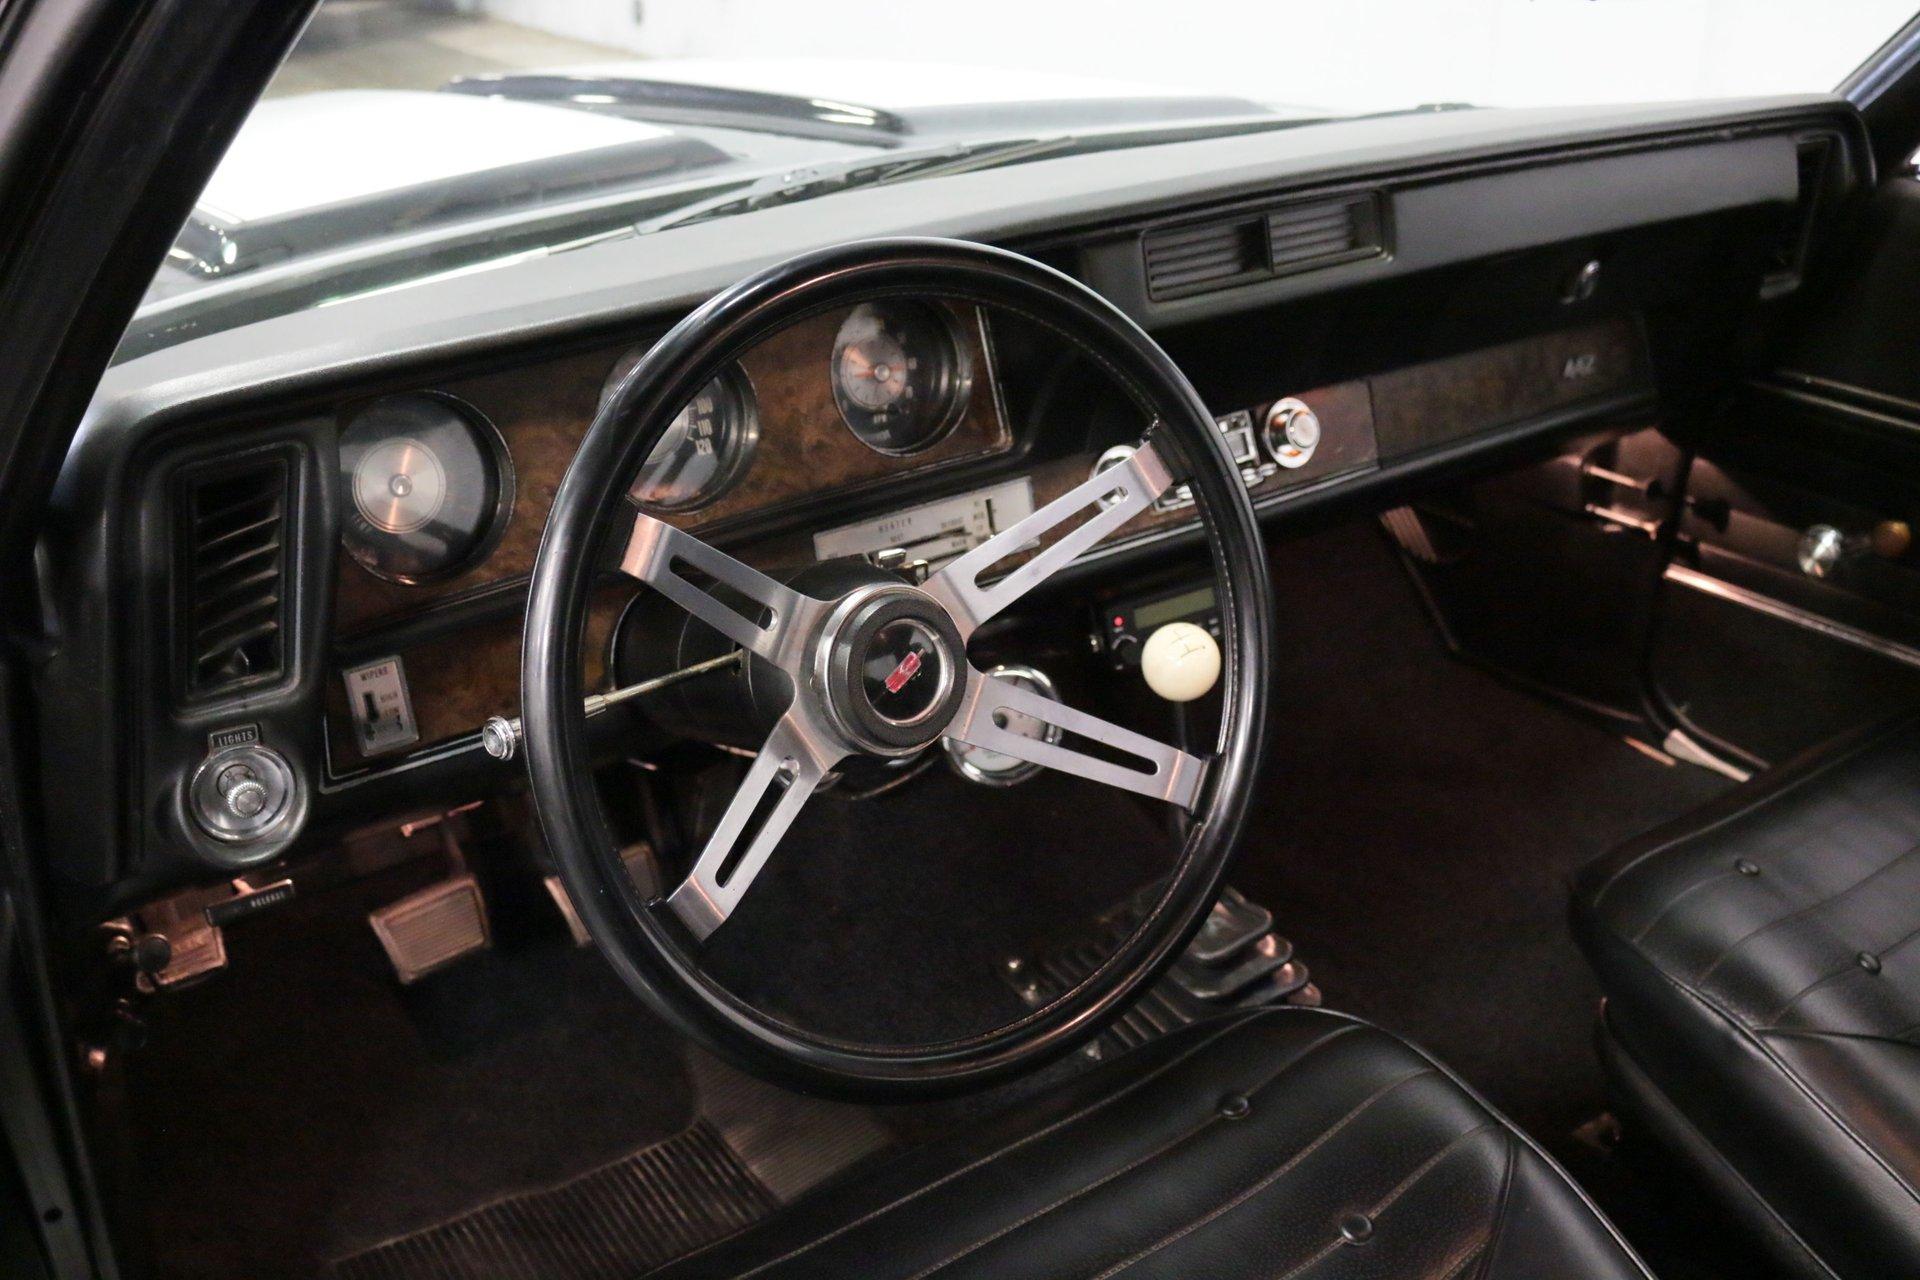 1970 Oldsmobile Cutlass 442 W-30 Tribute for sale #131159 | MCG